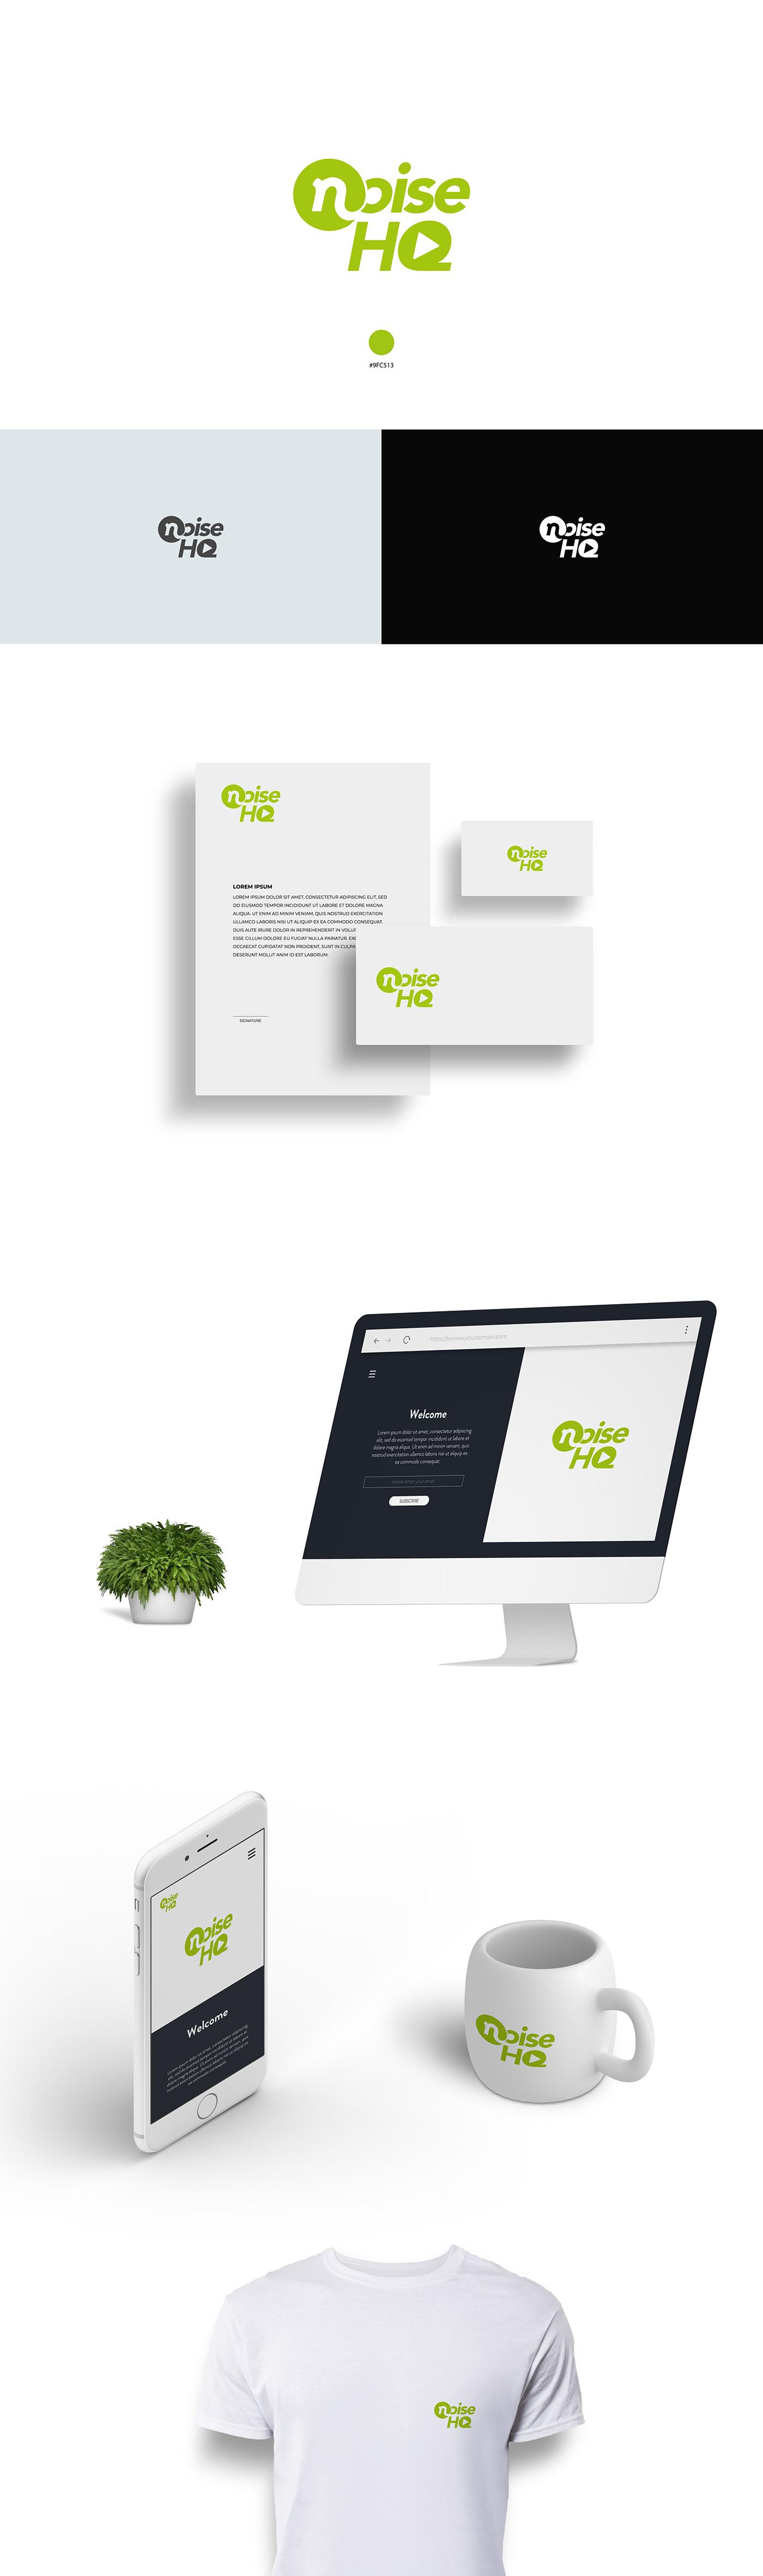 brand identity branding  business corporate design graphic design  Illustrator Logo Design photoshop Stationery